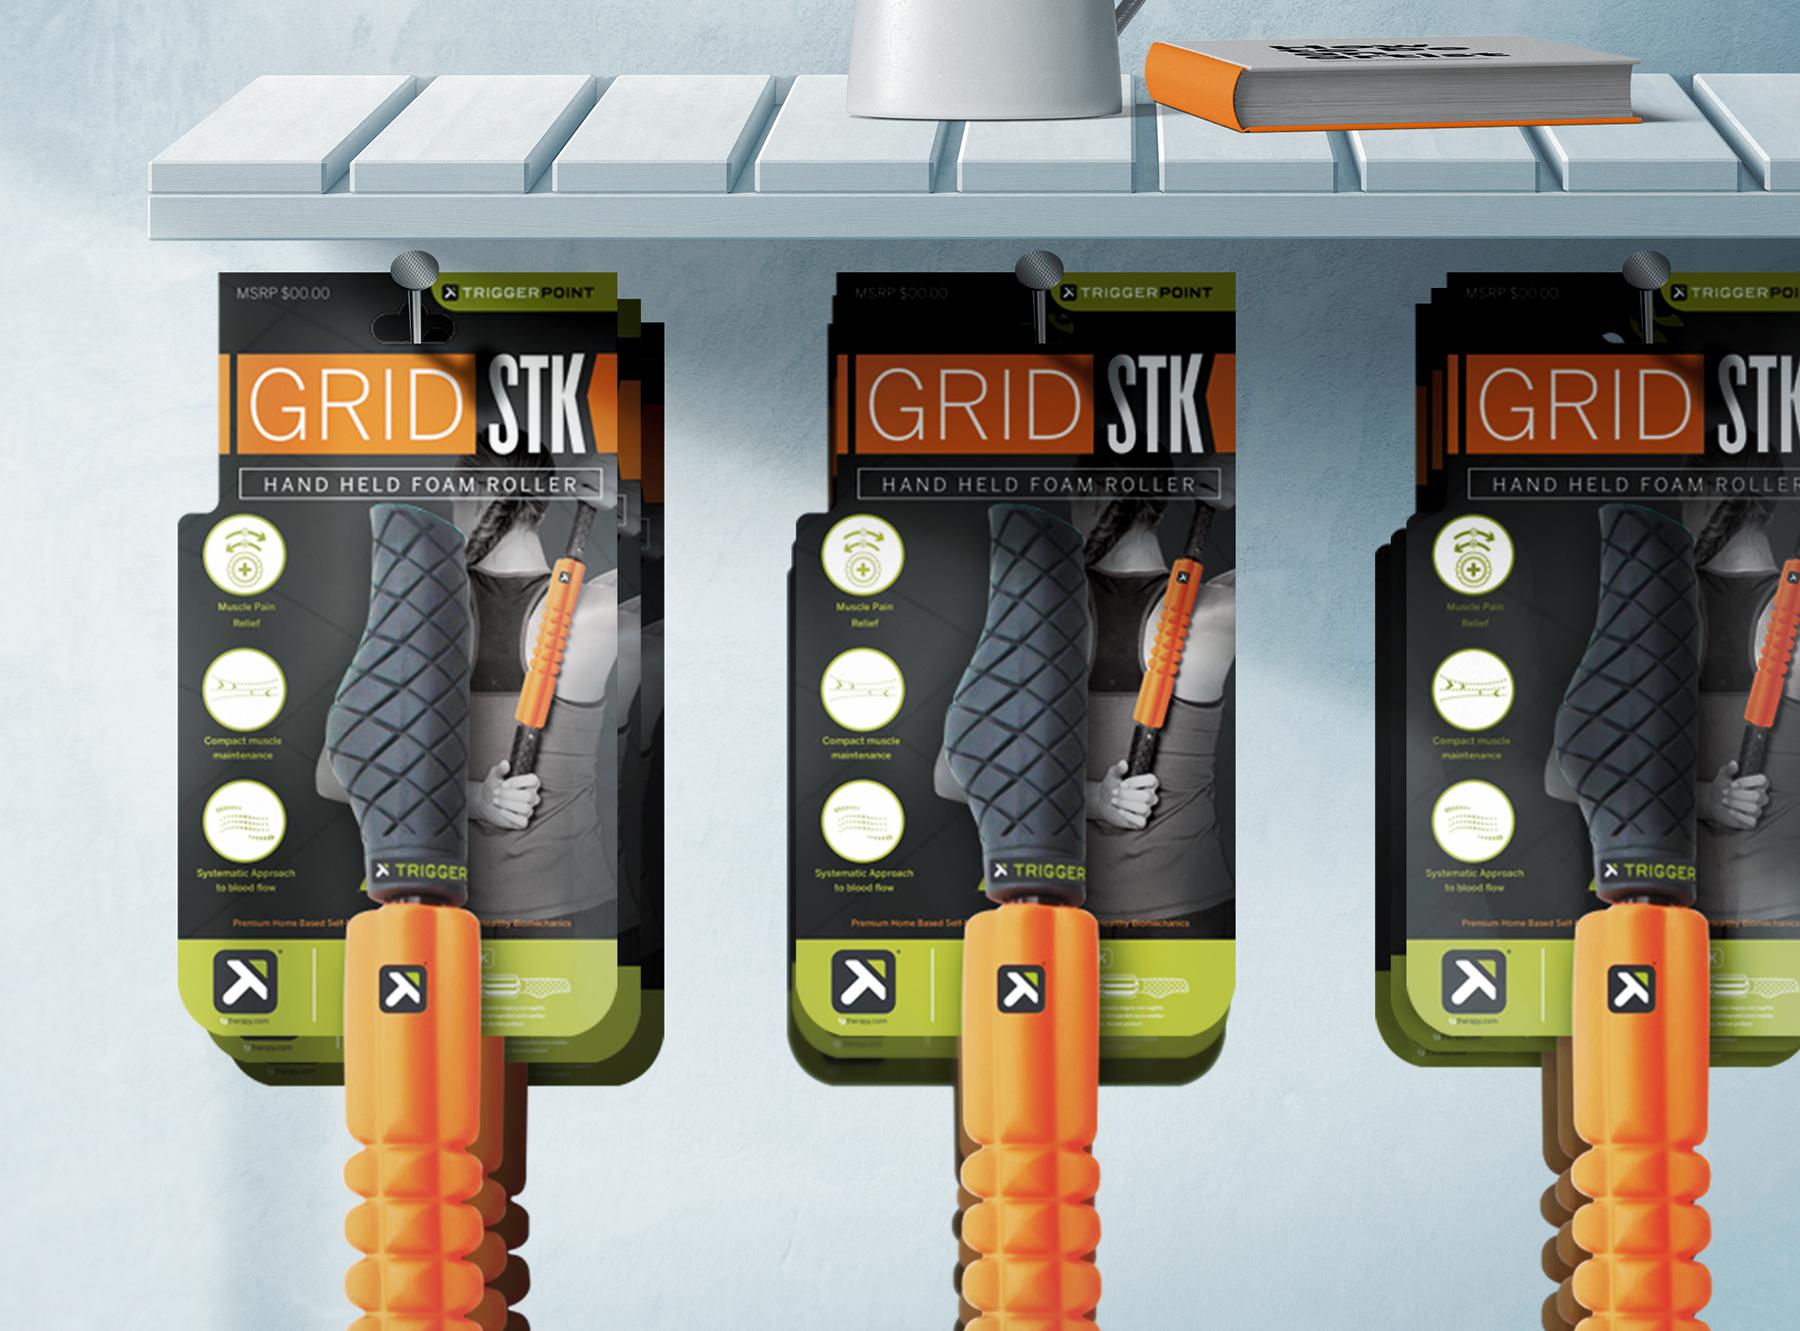 TP_The_GRID_STK.jpg